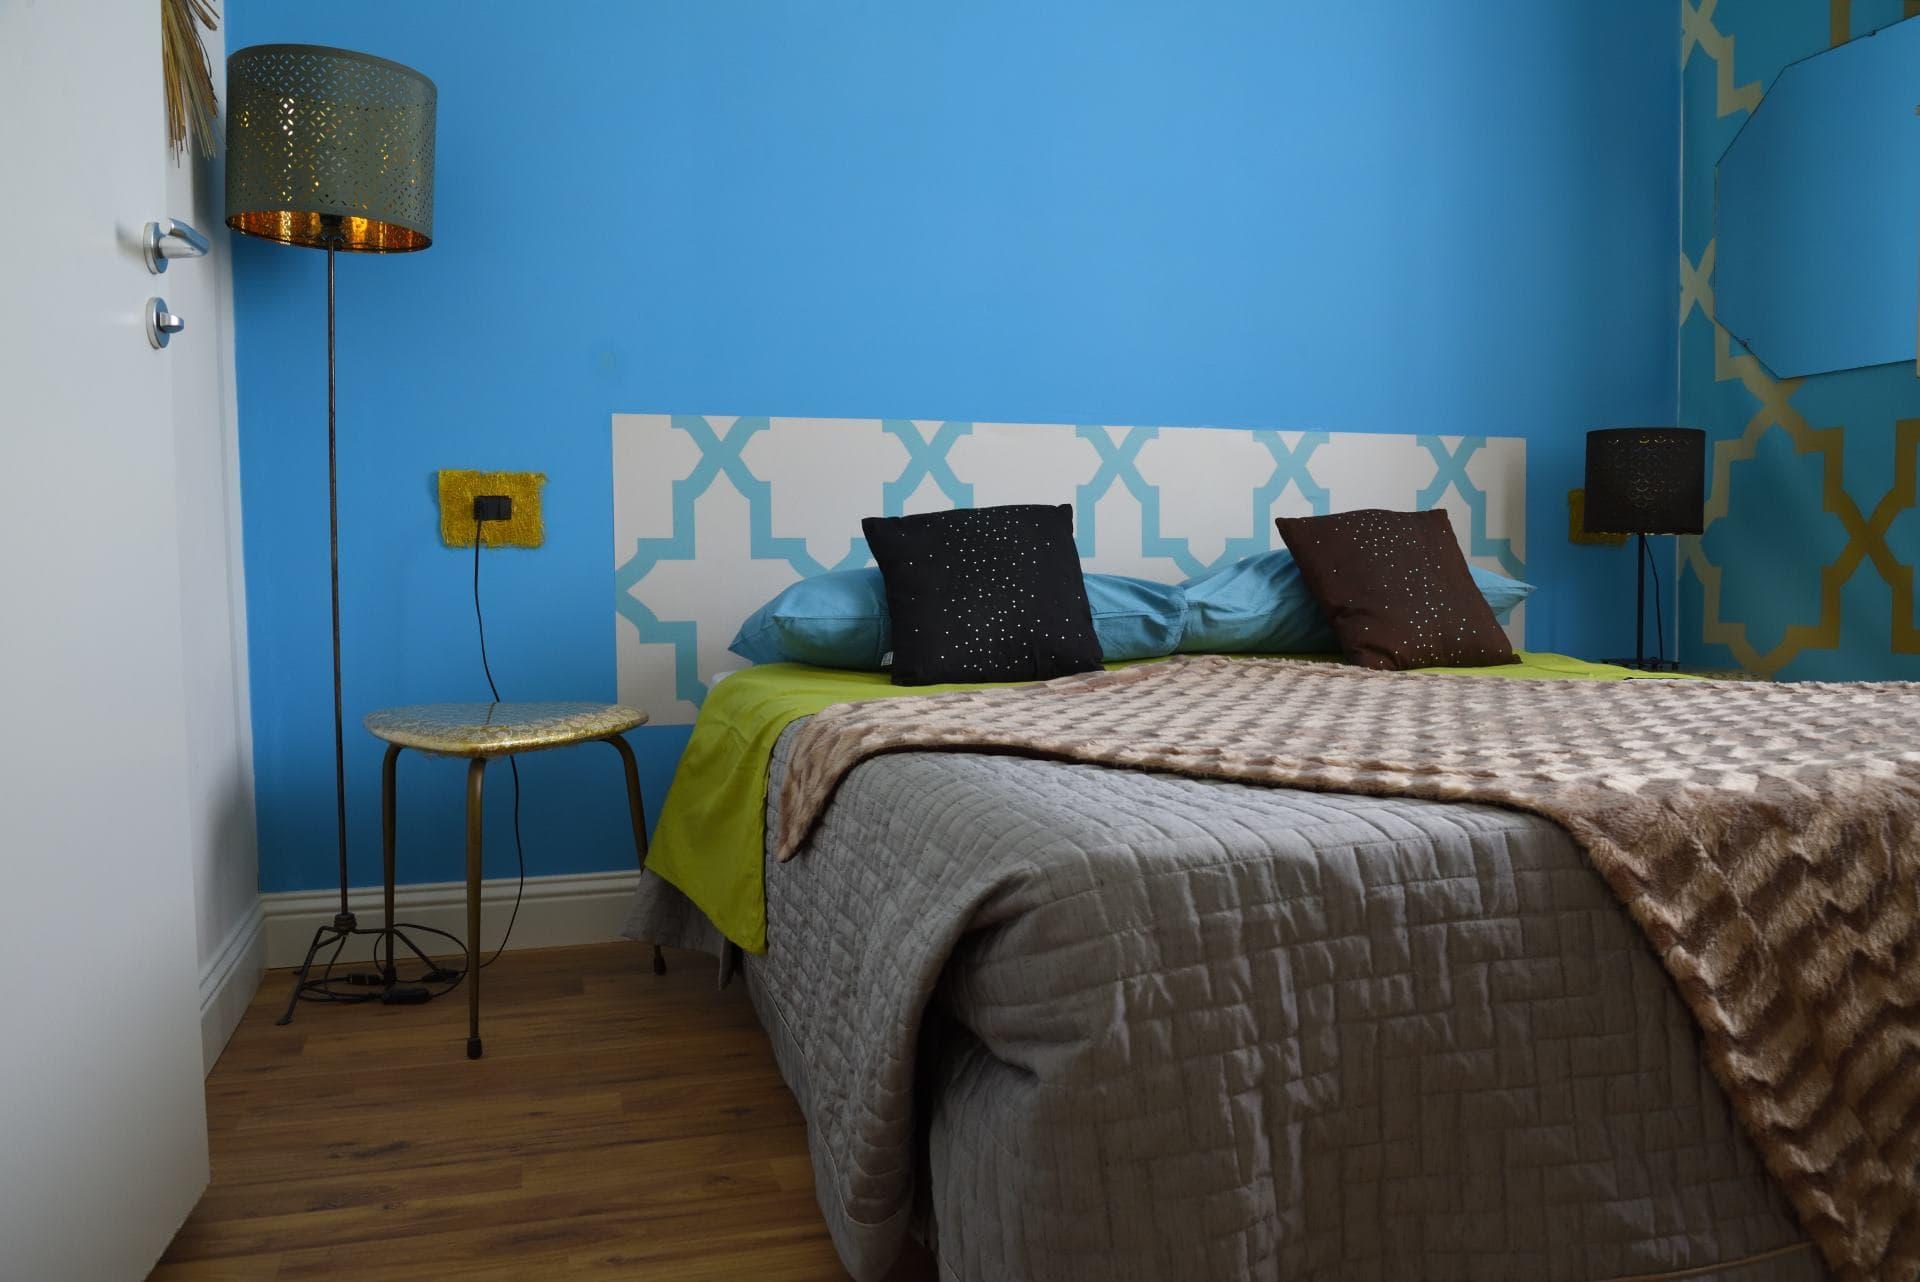 B&B a Pontassieve; Guest House, Case Vacanza, Appartamenti, Agriturismo, Locande, Ostelli, Country House